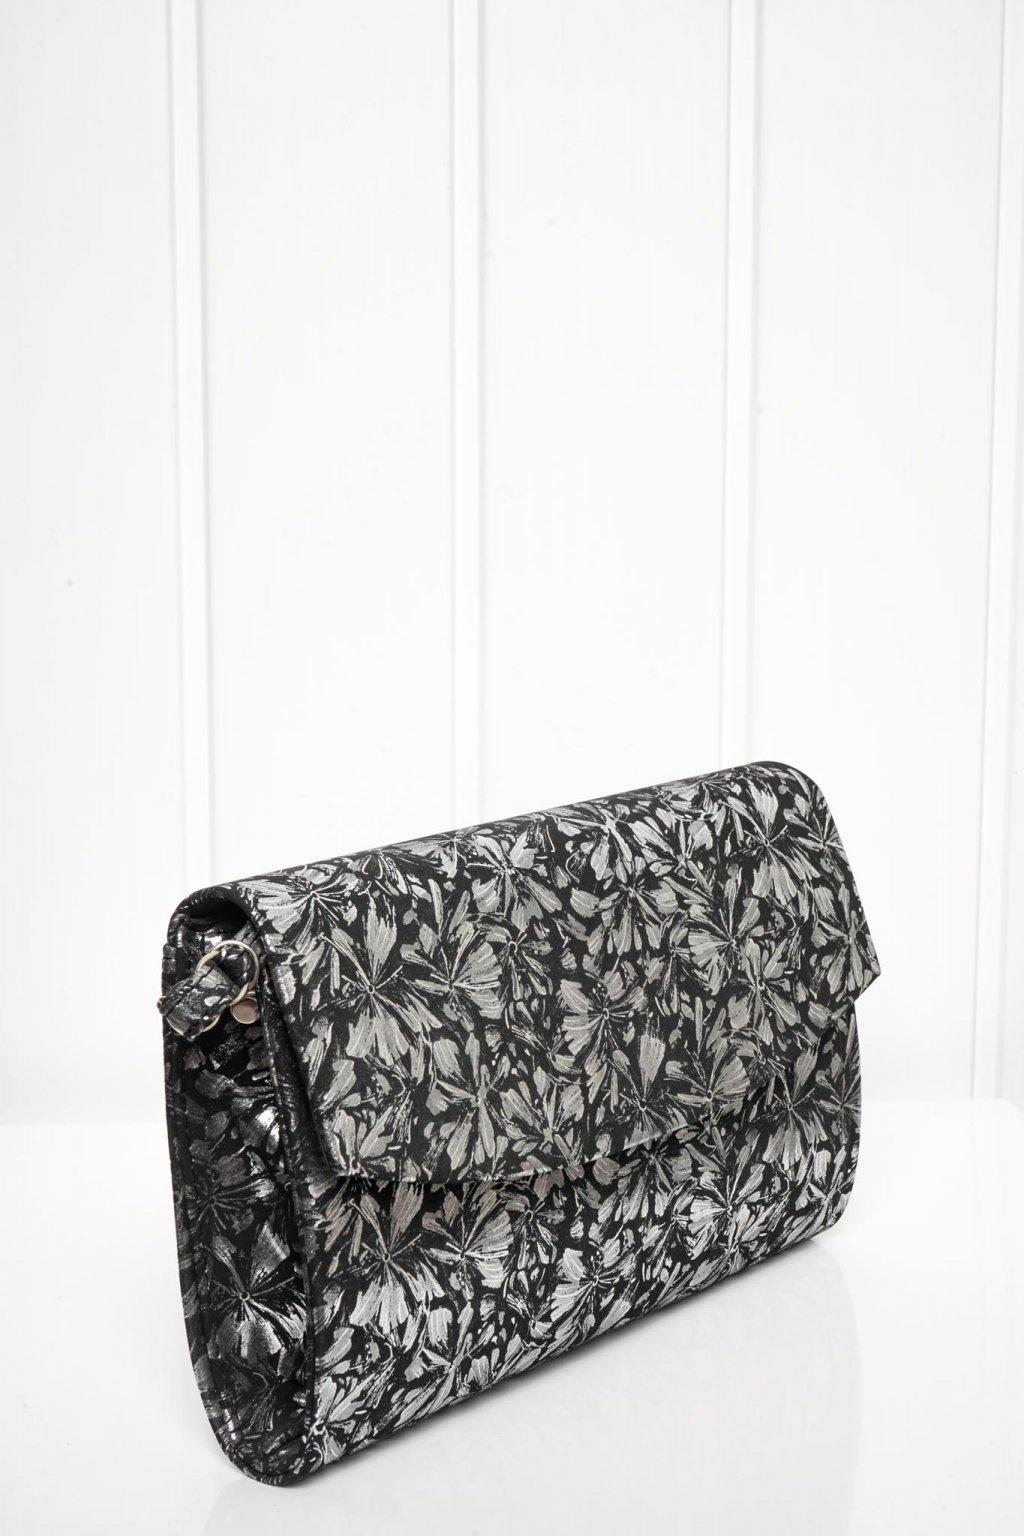 Kabelka, crossbody, ruksak, shopping bag, shopperka, 550